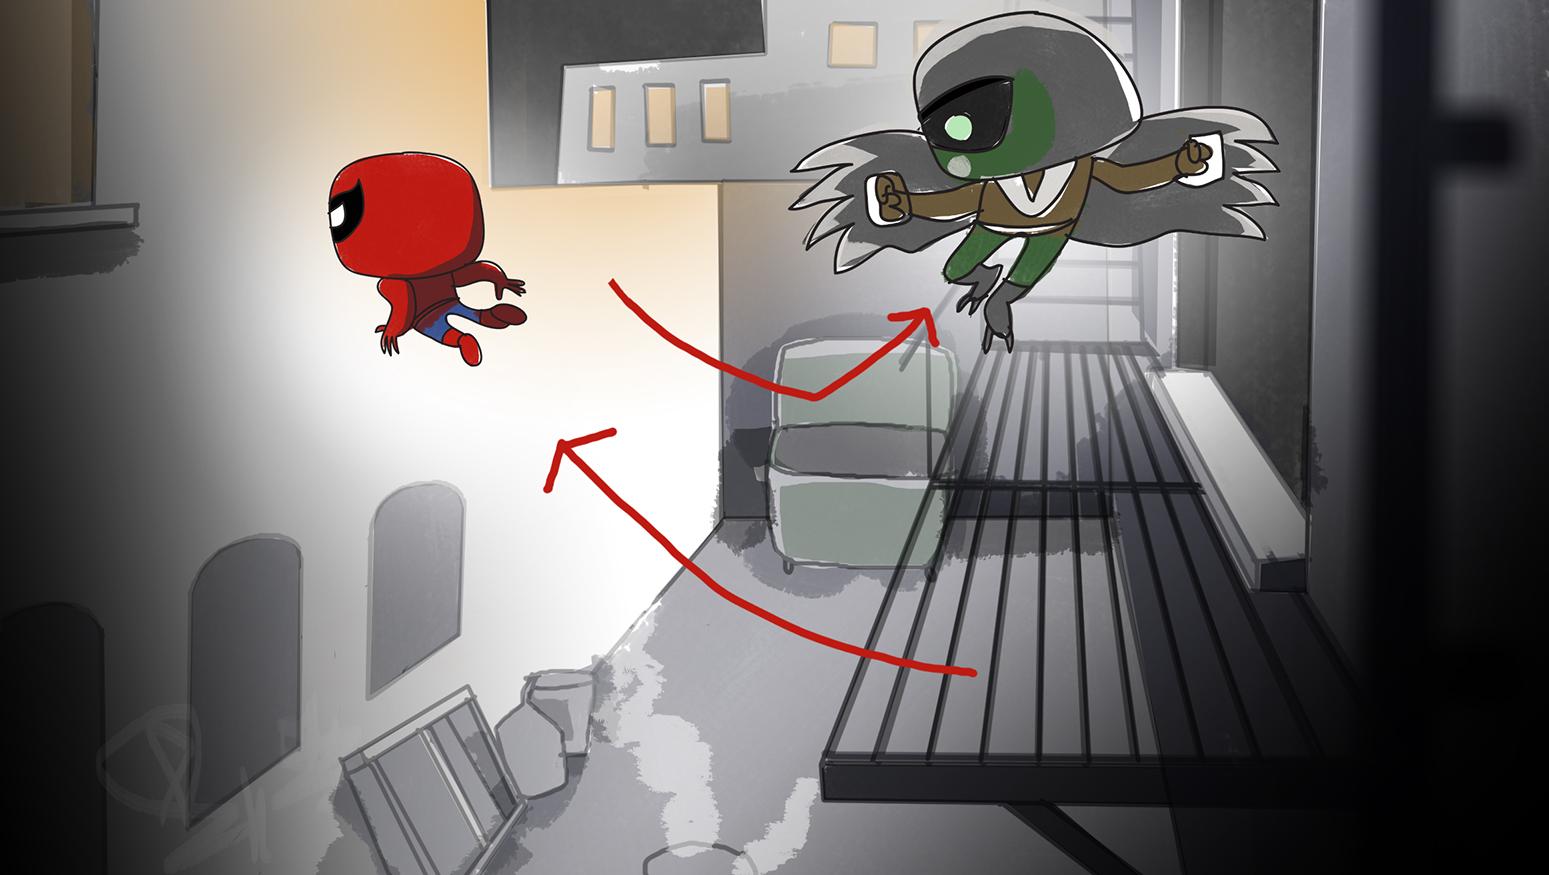 Spiderman_Vulture_04V04 copy.jpg